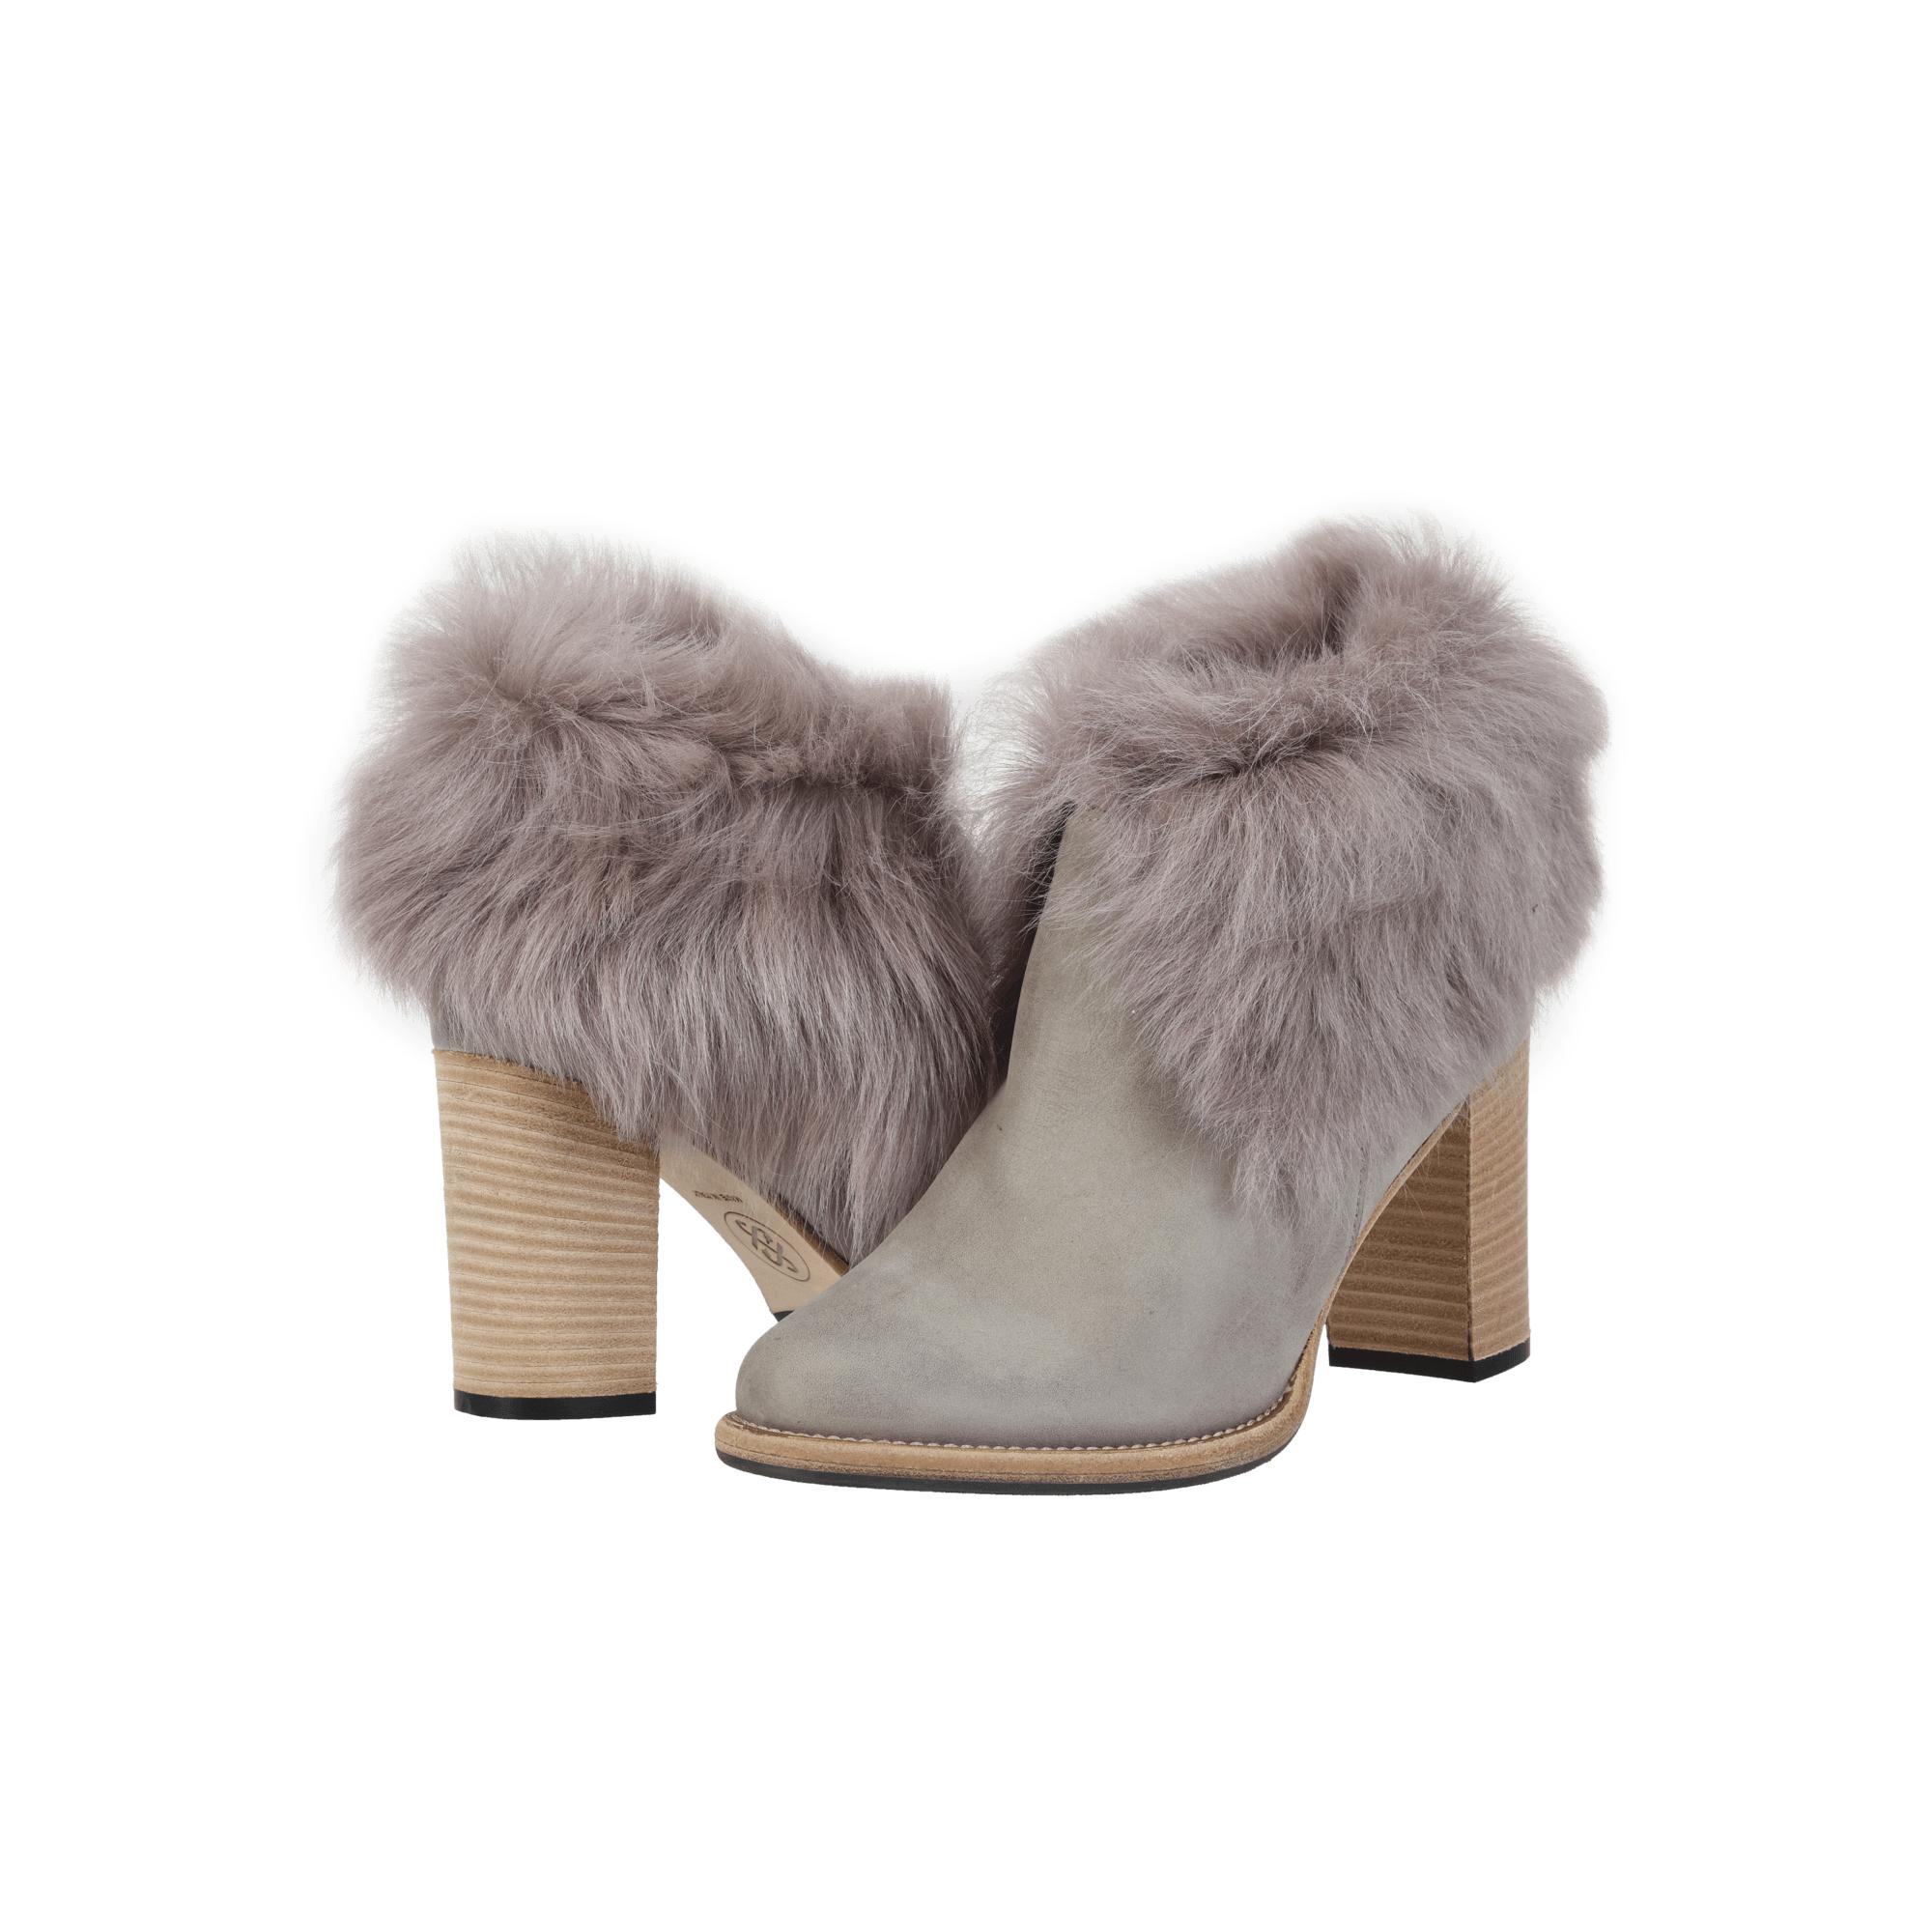 Ross & Snow Angelina Women's Desert Rose Cuff Boot - Discount Italian Shoes